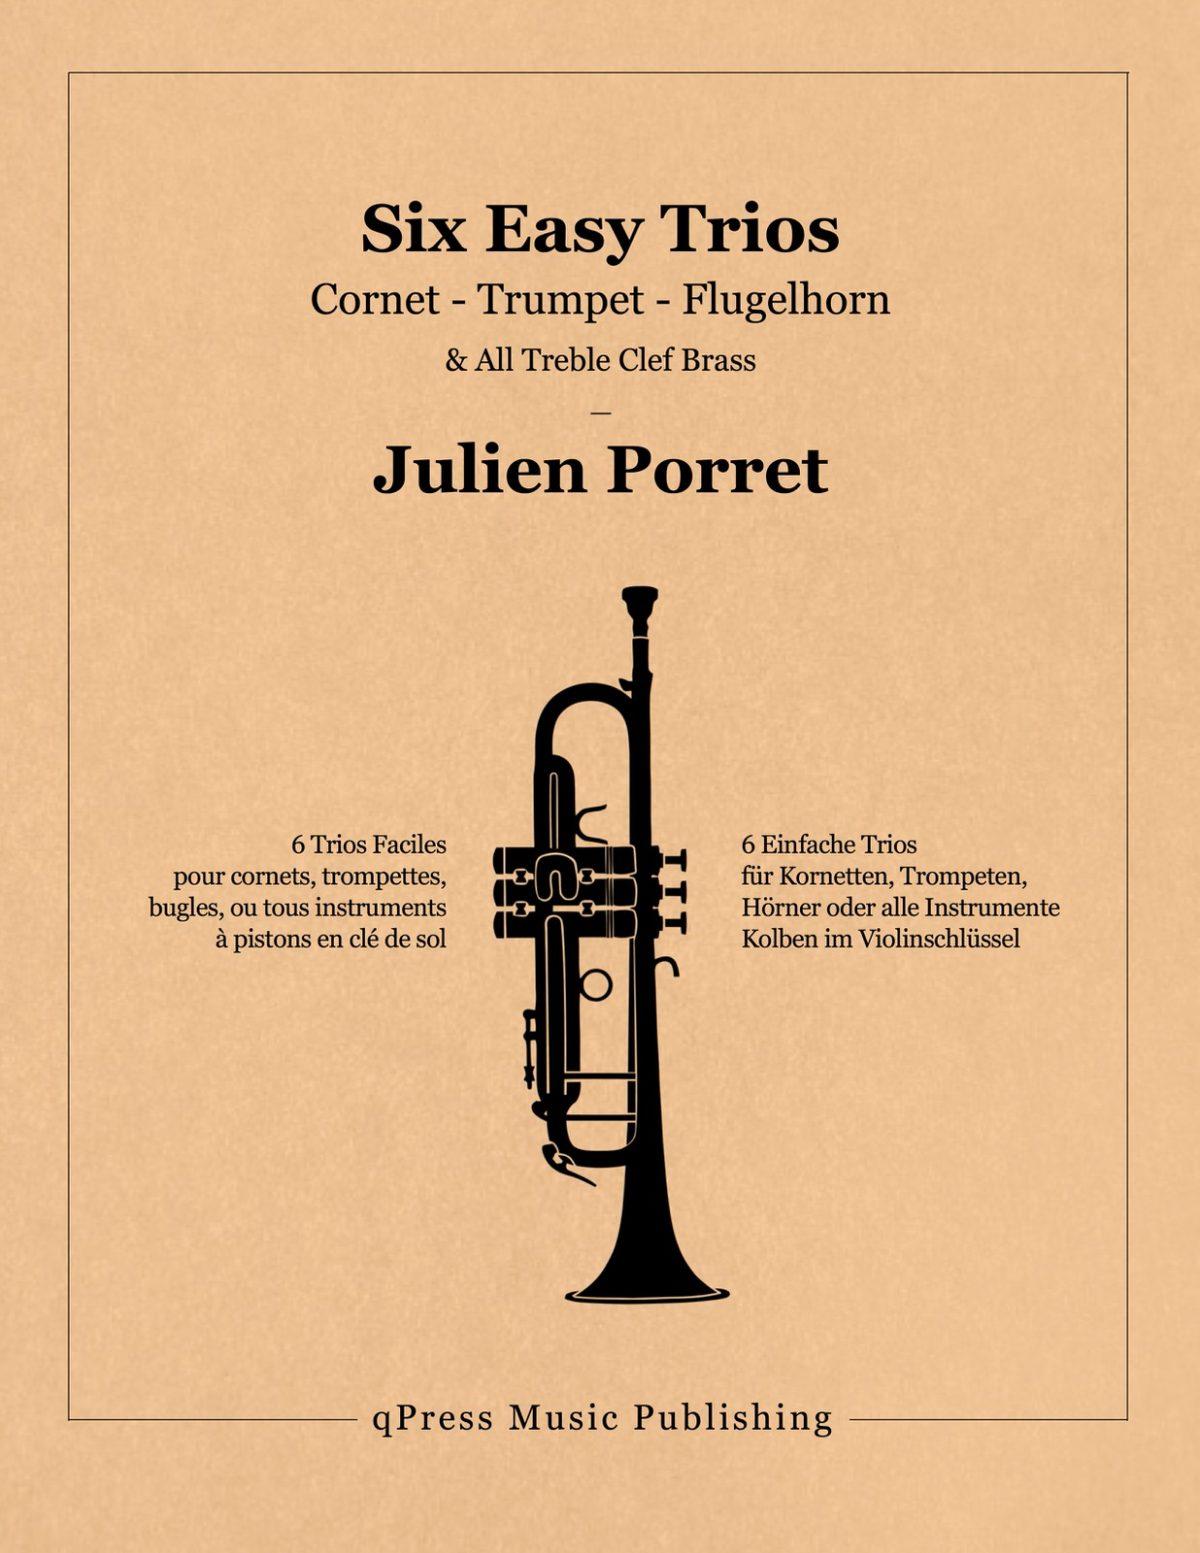 Porret, Six Easy Trios For Treble Clef Brass-p01